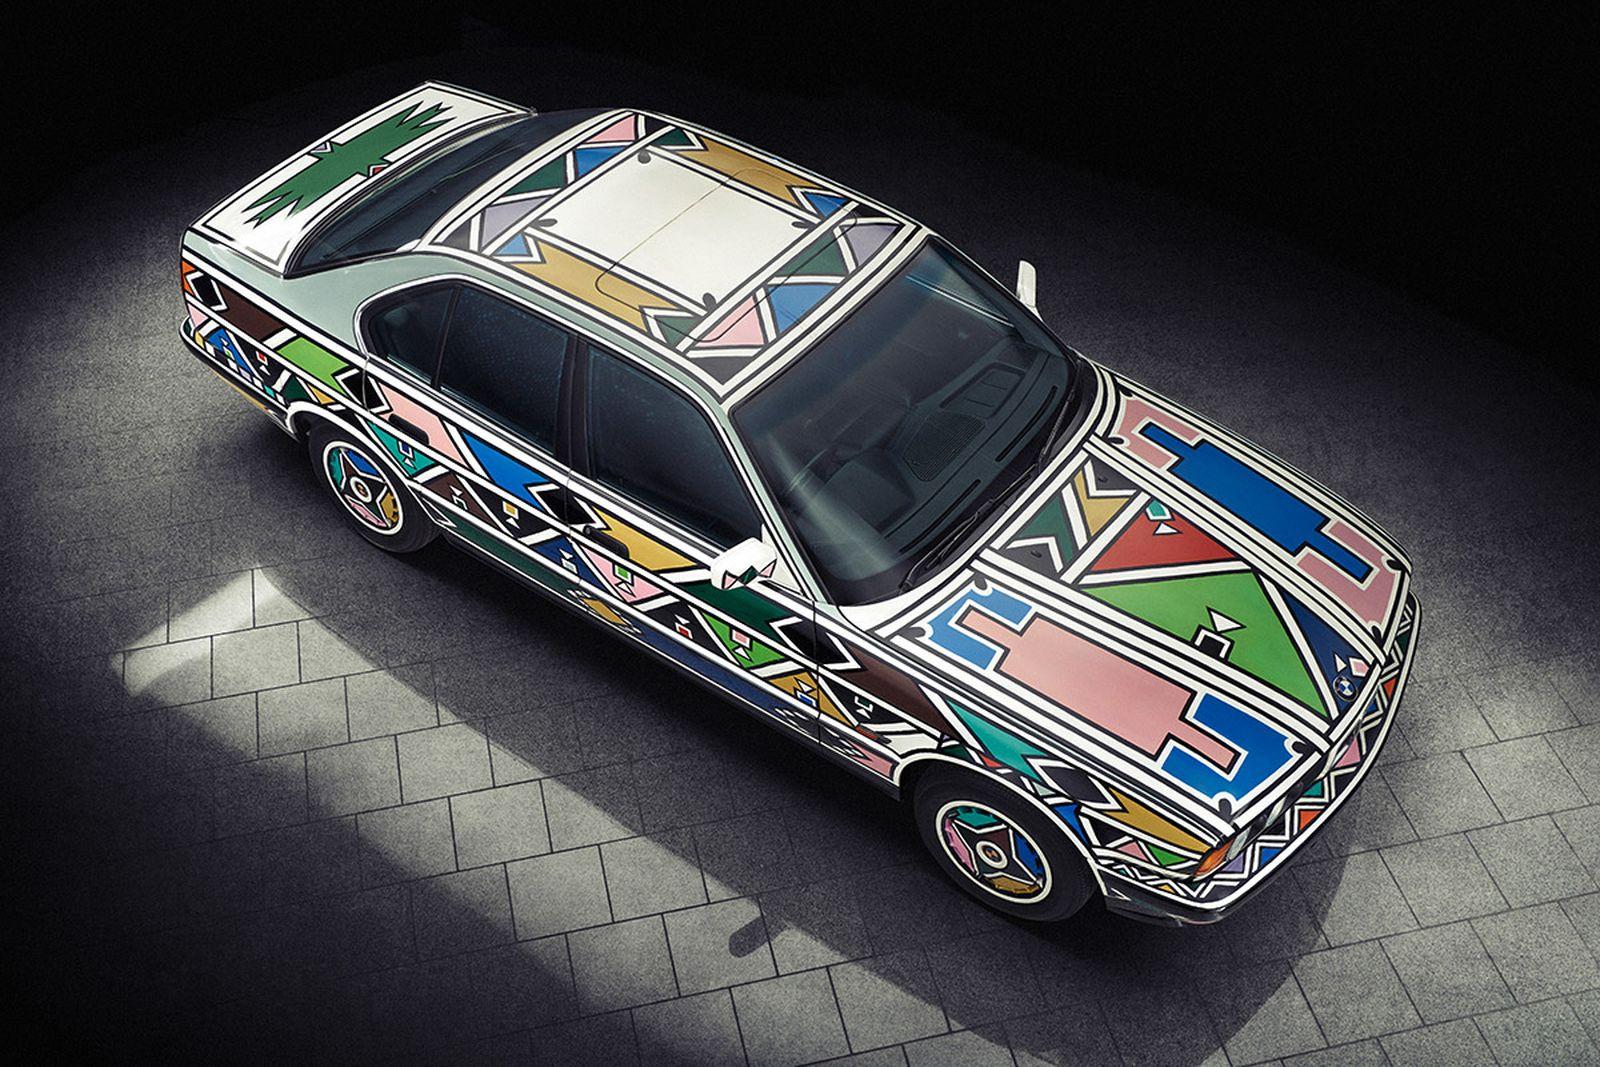 BMW Art Car 12, Esther Mahlangu, 1991